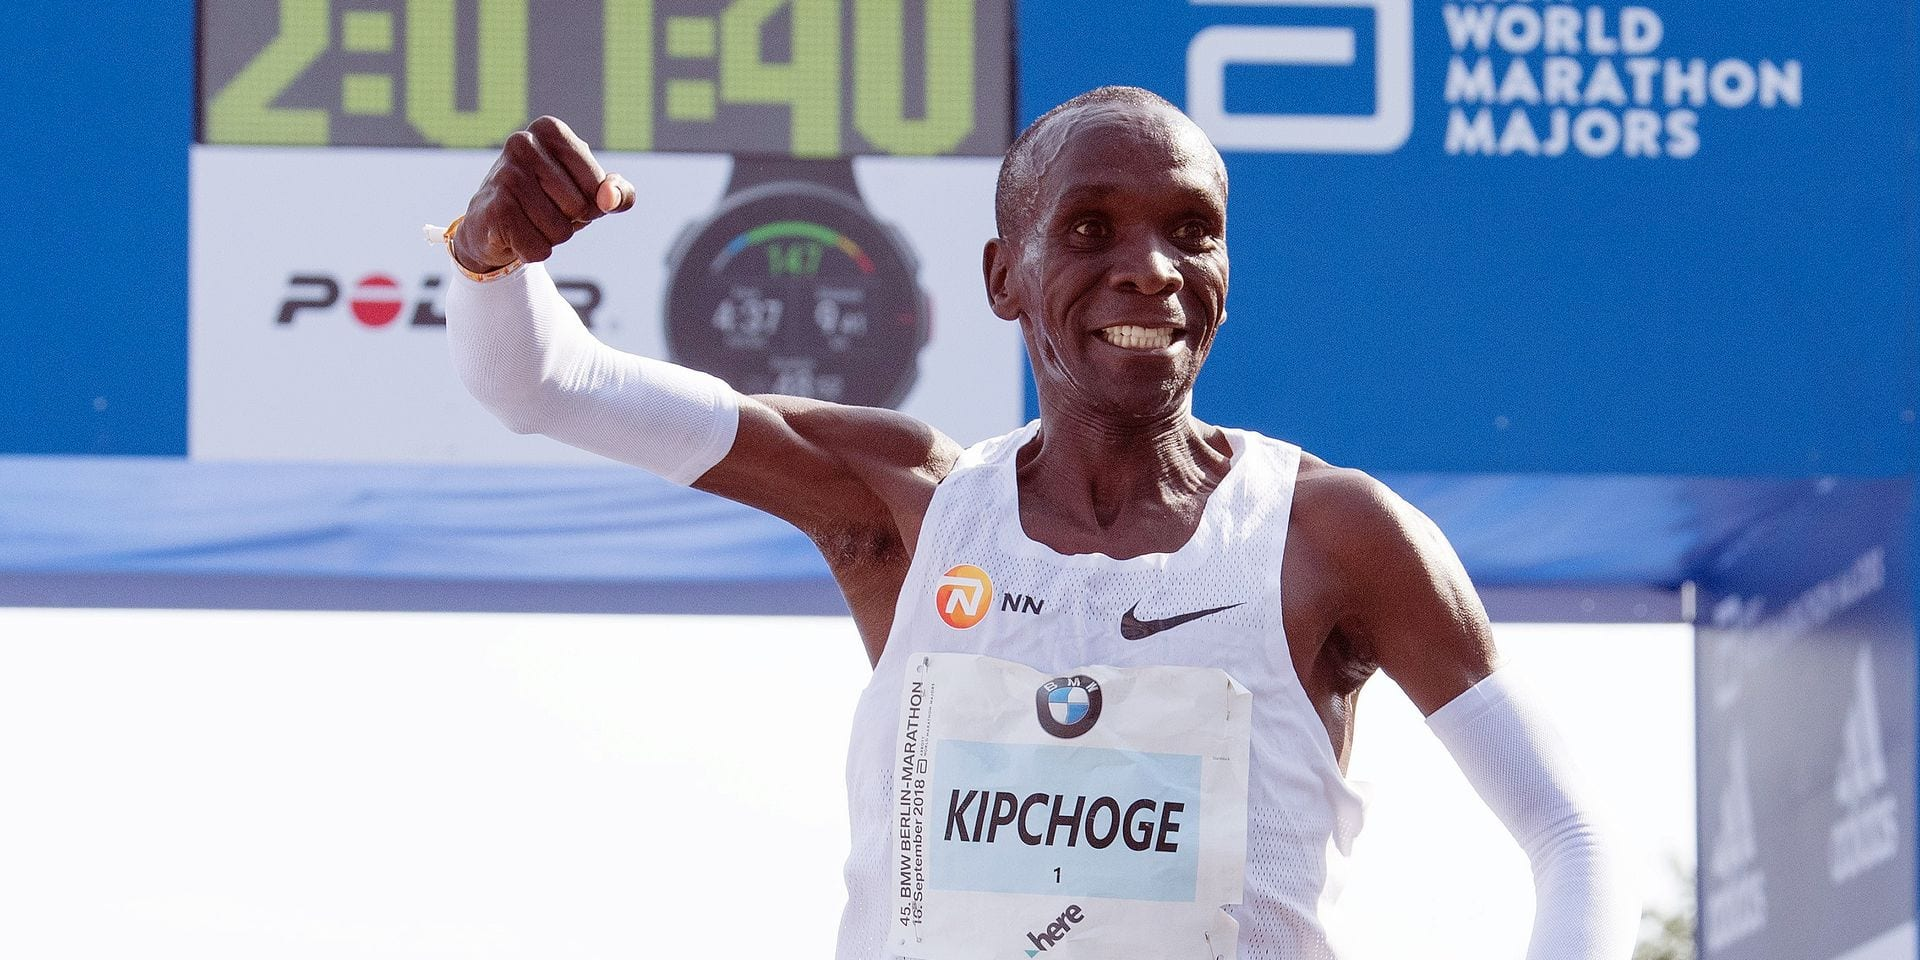 16 September 2018, Berlin: Kenyan Eliud Kipchoge winning the 45th BMW Berlin Marathon in 2:01:39 hours. He set a world record. Photo: Soeren Stache/dpa Reporters / DPA